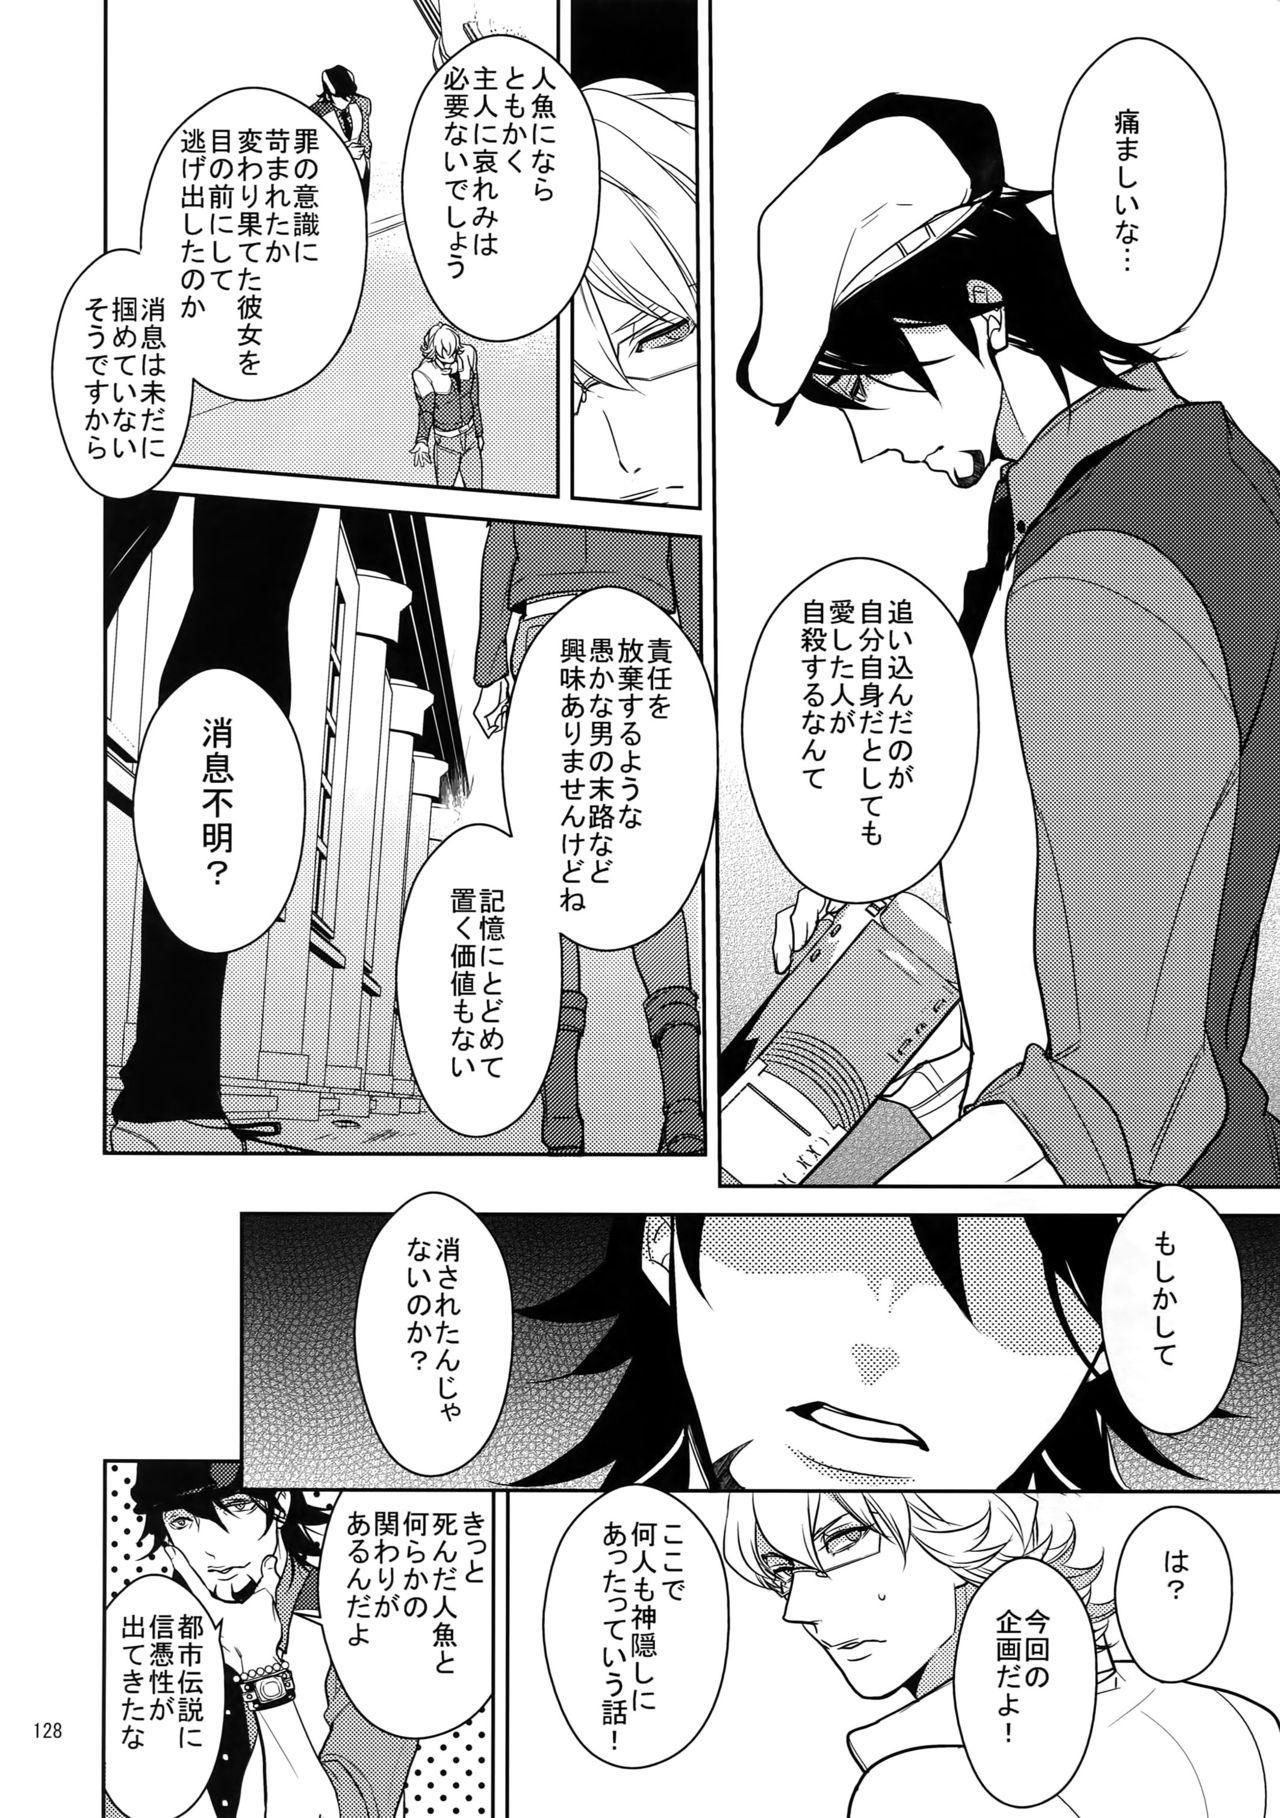 BOROZS Usagi Tora Sairoku 2 126